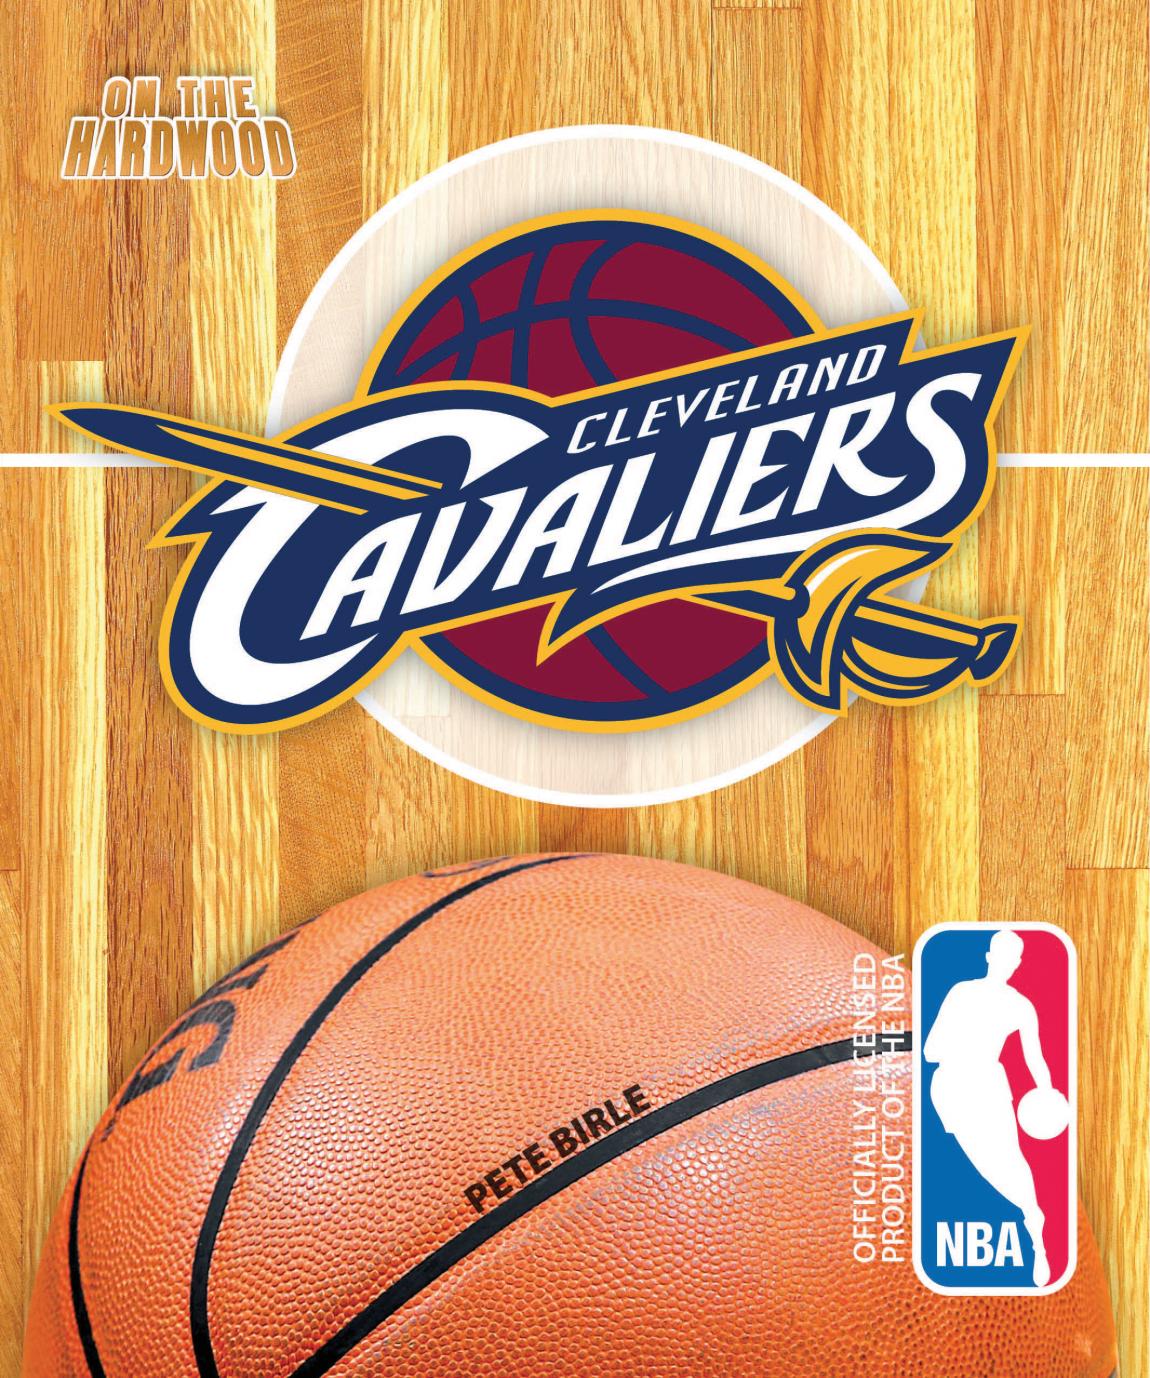 Cavaliers-1.png